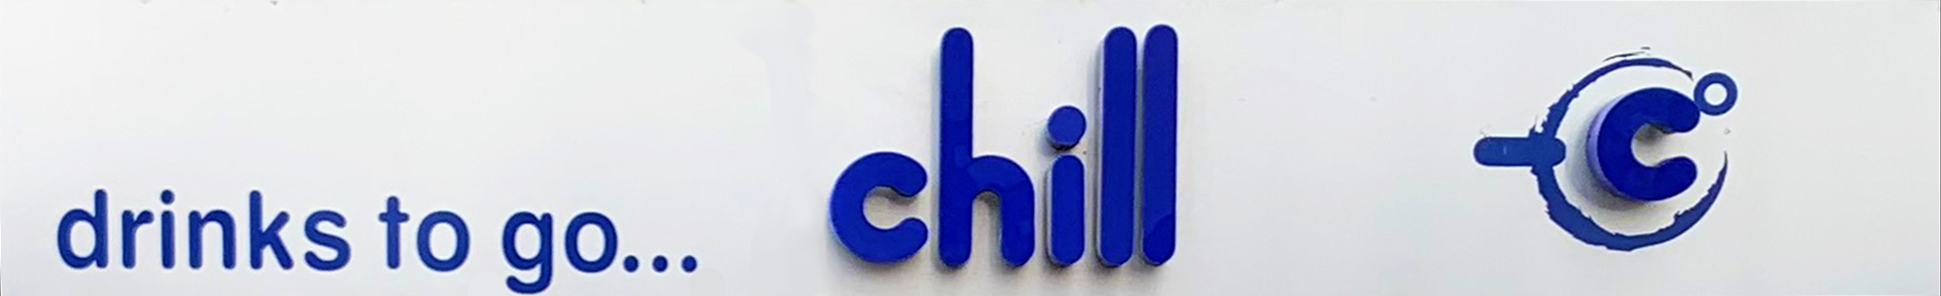 Chill1